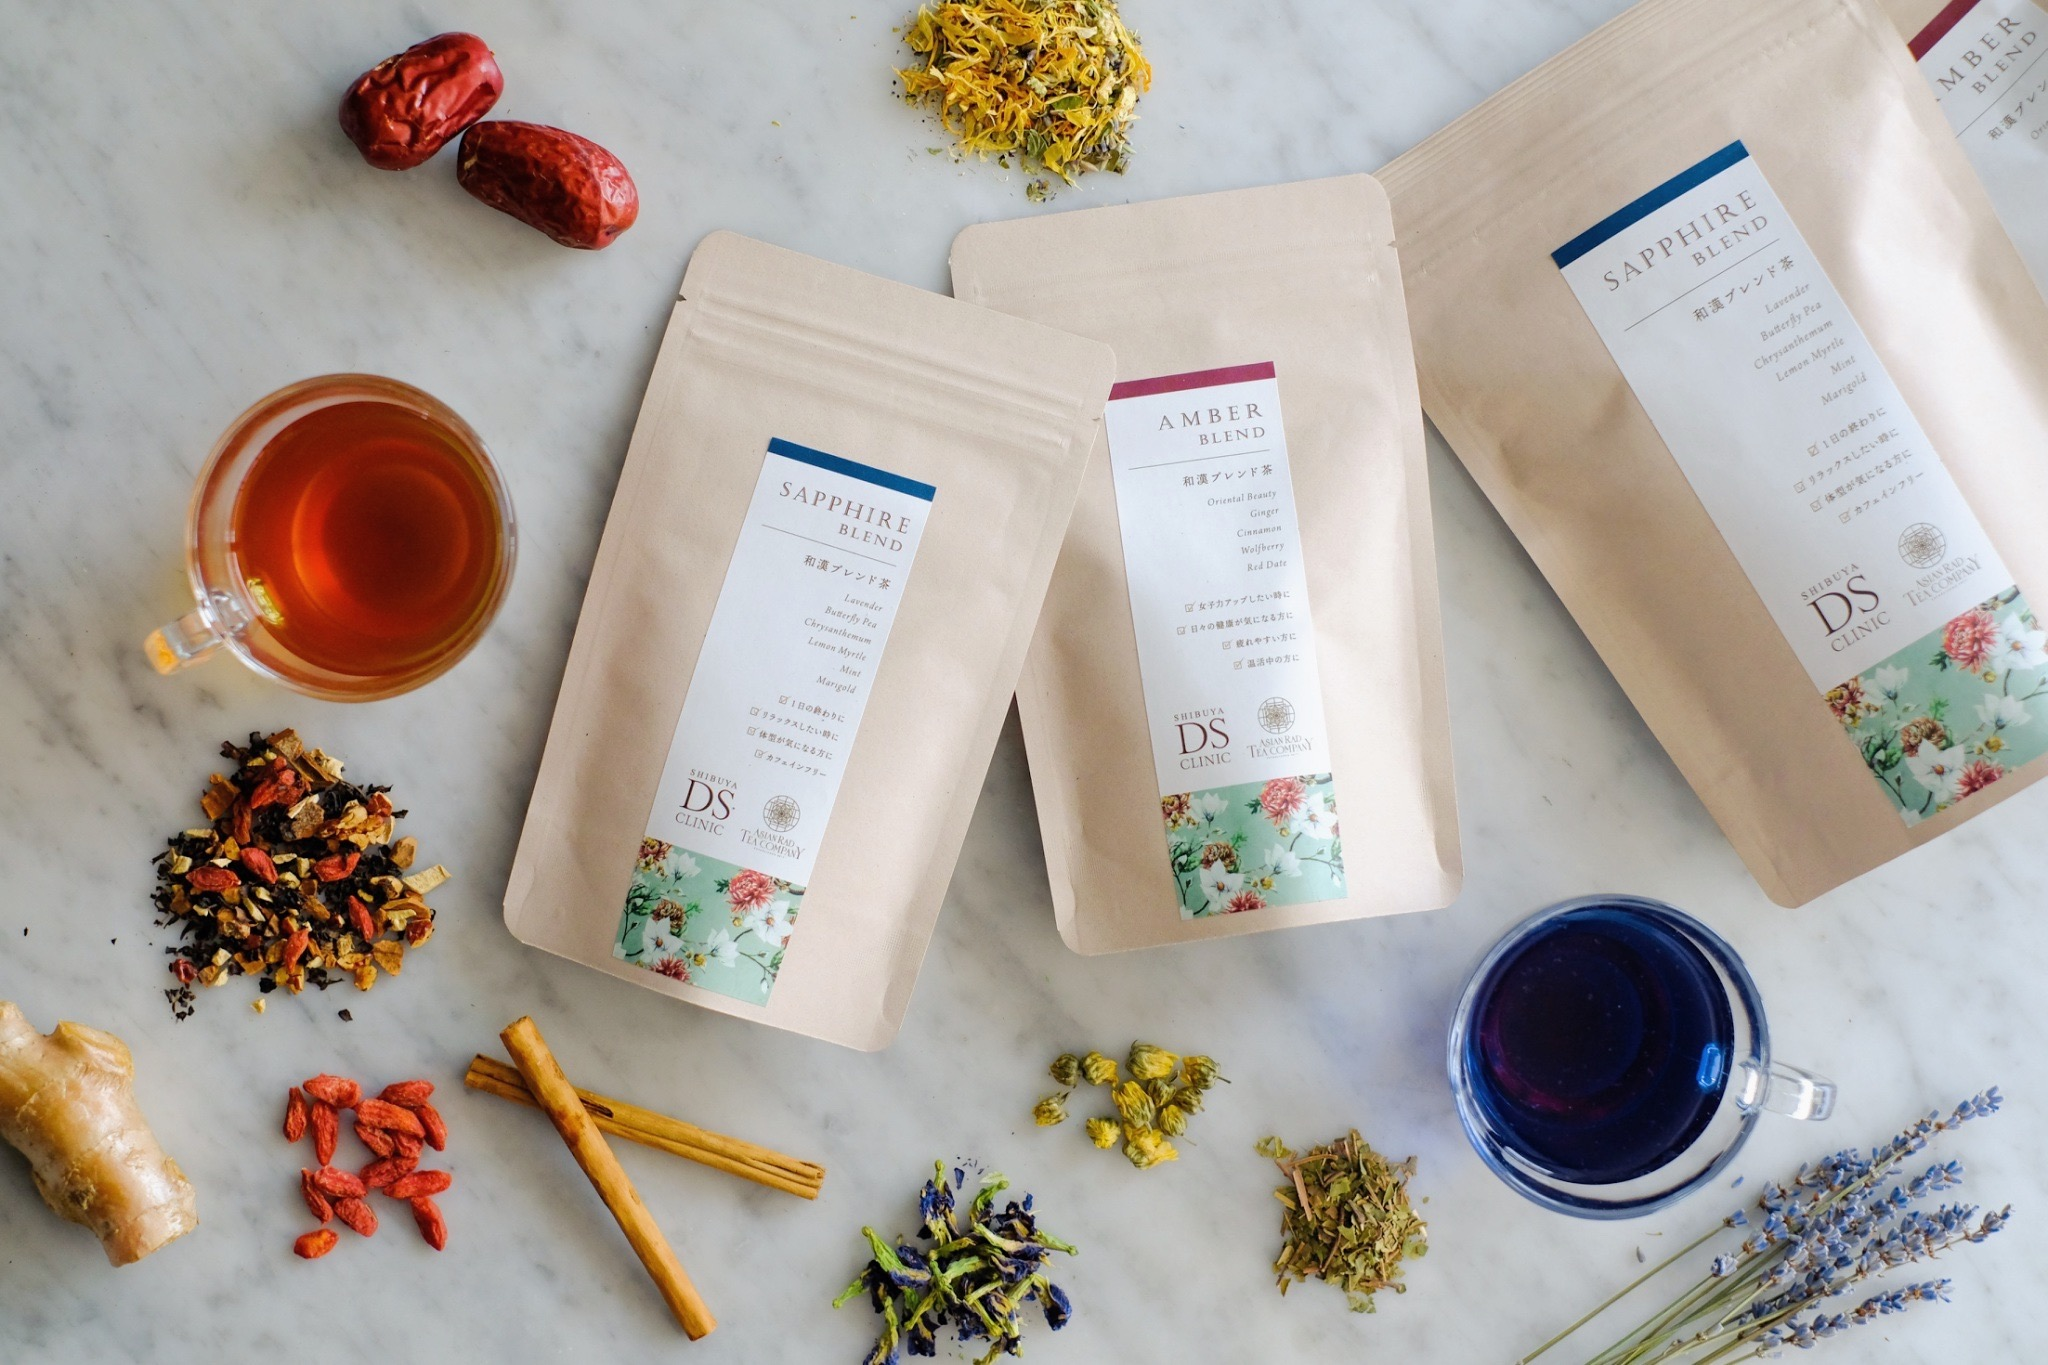 『ASIAN RAD TEA COMPANY』と『渋谷DSクリニック』の漢方薬剤師が、 美味しくて内側から美しくなる和漢ブレンド茶を共同開発